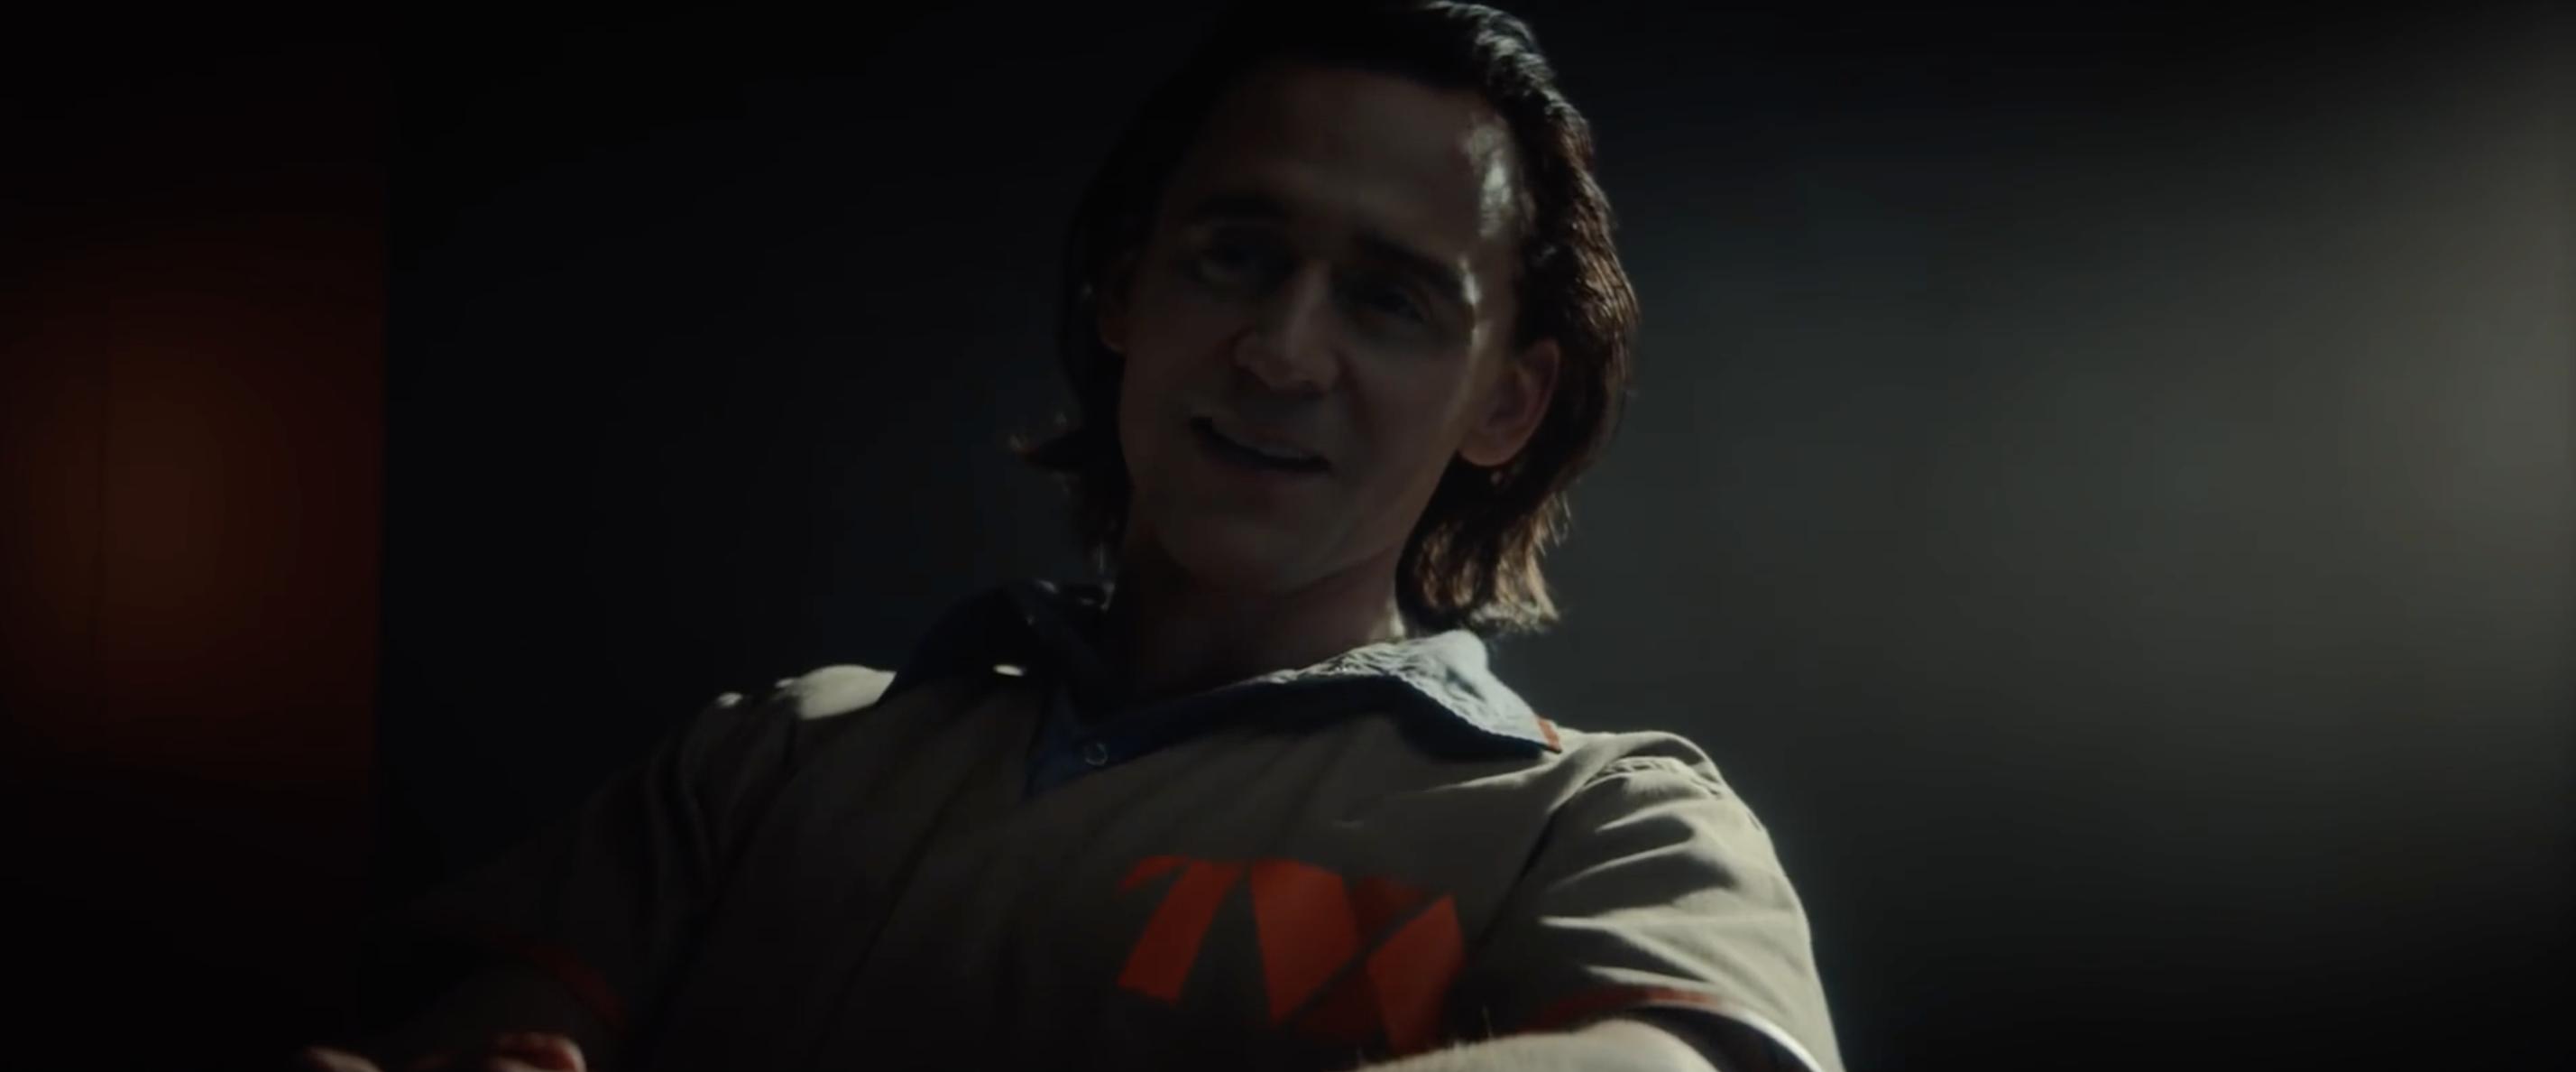 Séries Loki, WandaVision, Falcon and the Winter Soldier : Marvel dévoile les teasers